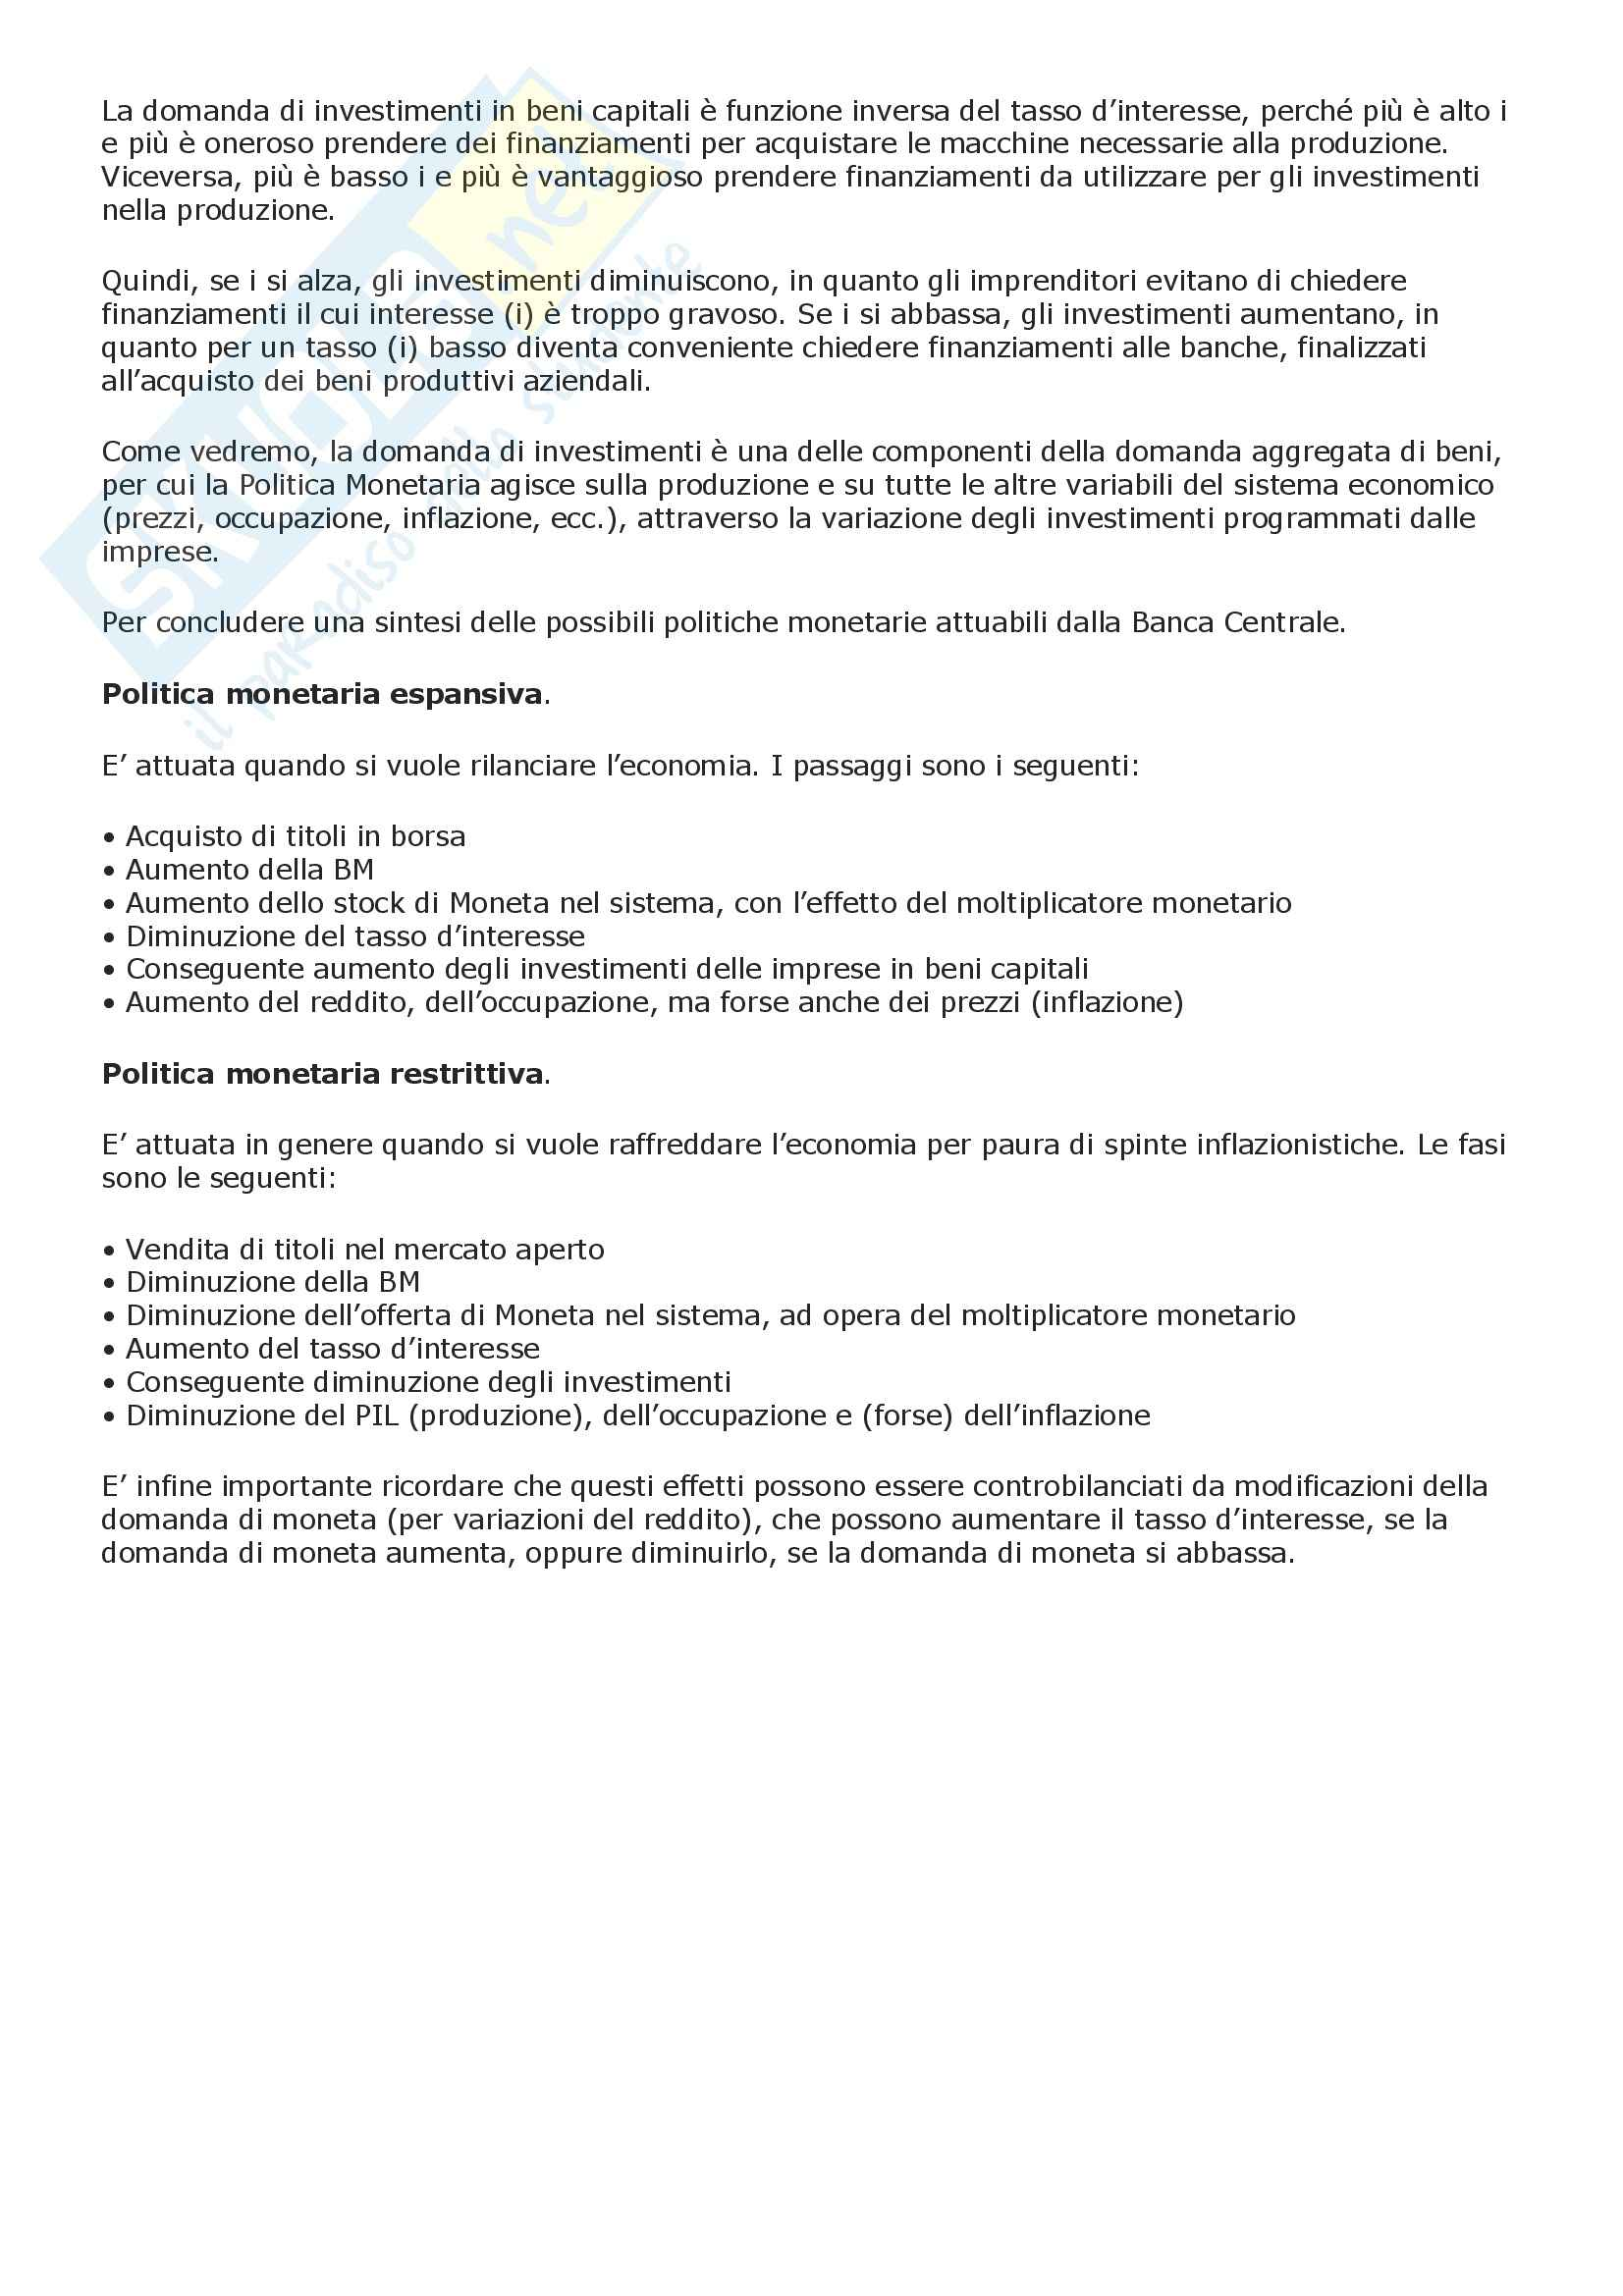 Macroeconomia - moneta e moltiplicatore monetario - Riassunto esame, prof. Bevolo Pag. 6